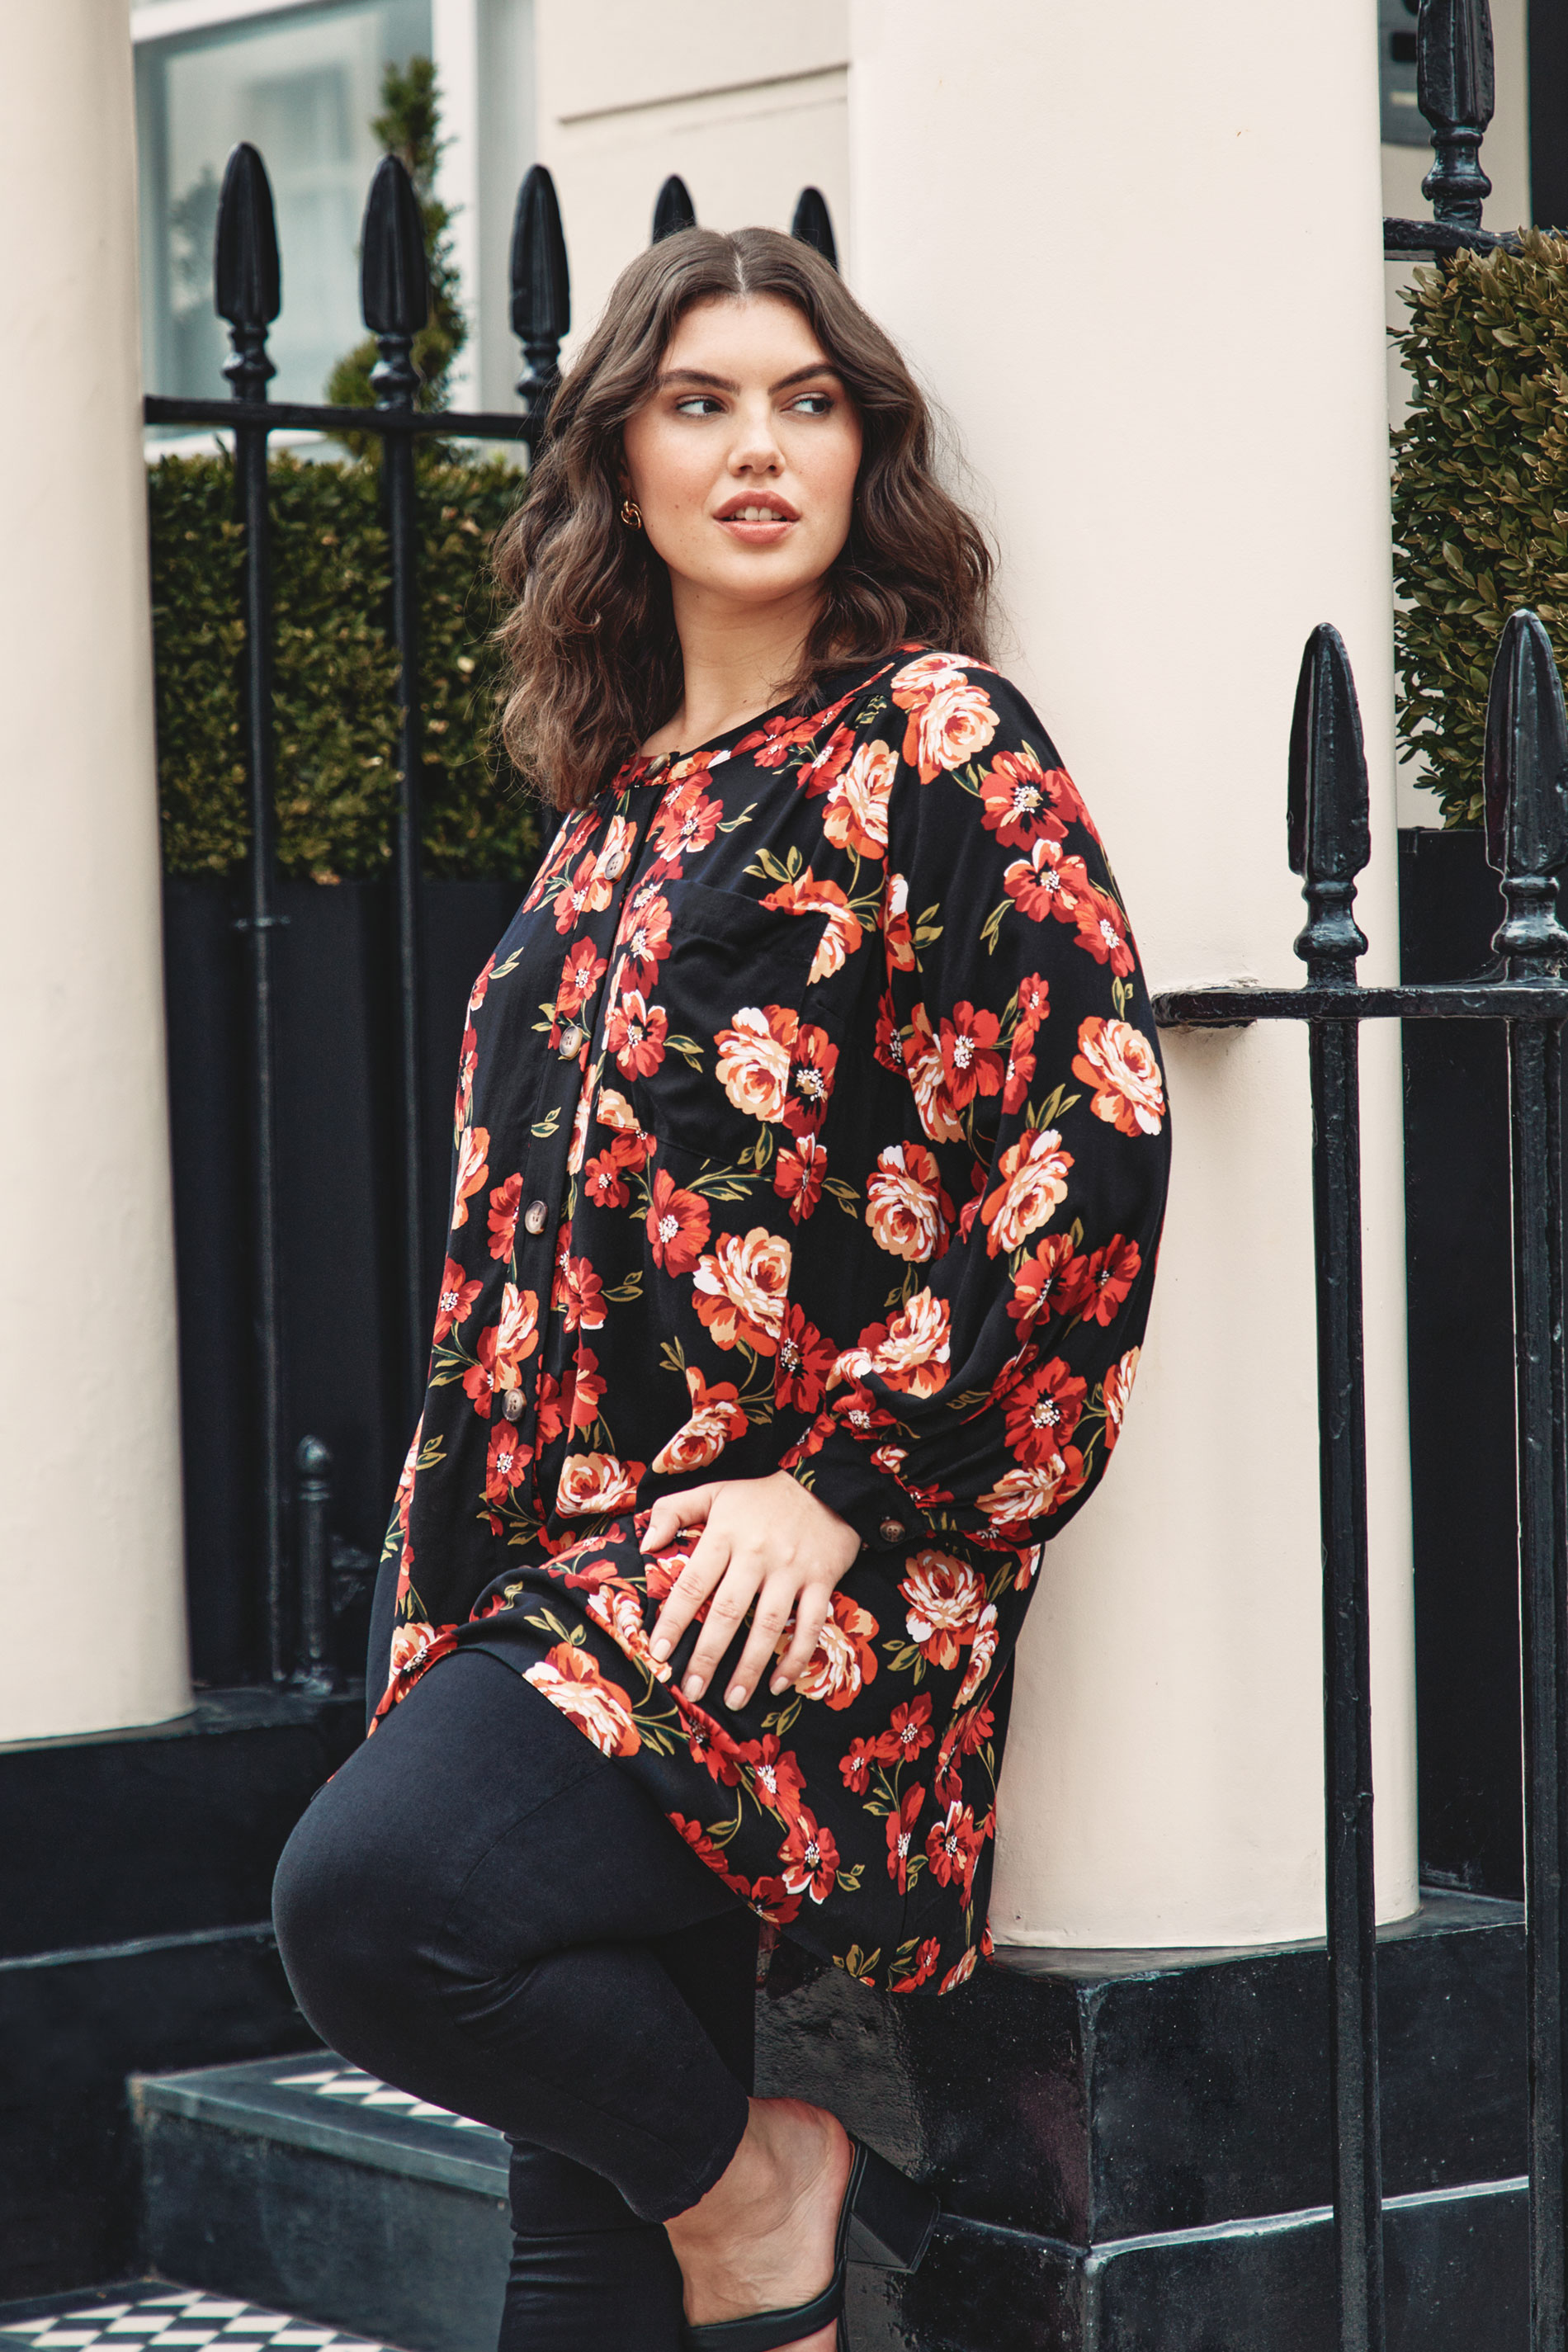 THE LIMITED EDIT Black Floral Smock Tiered Shirt_L.jpg